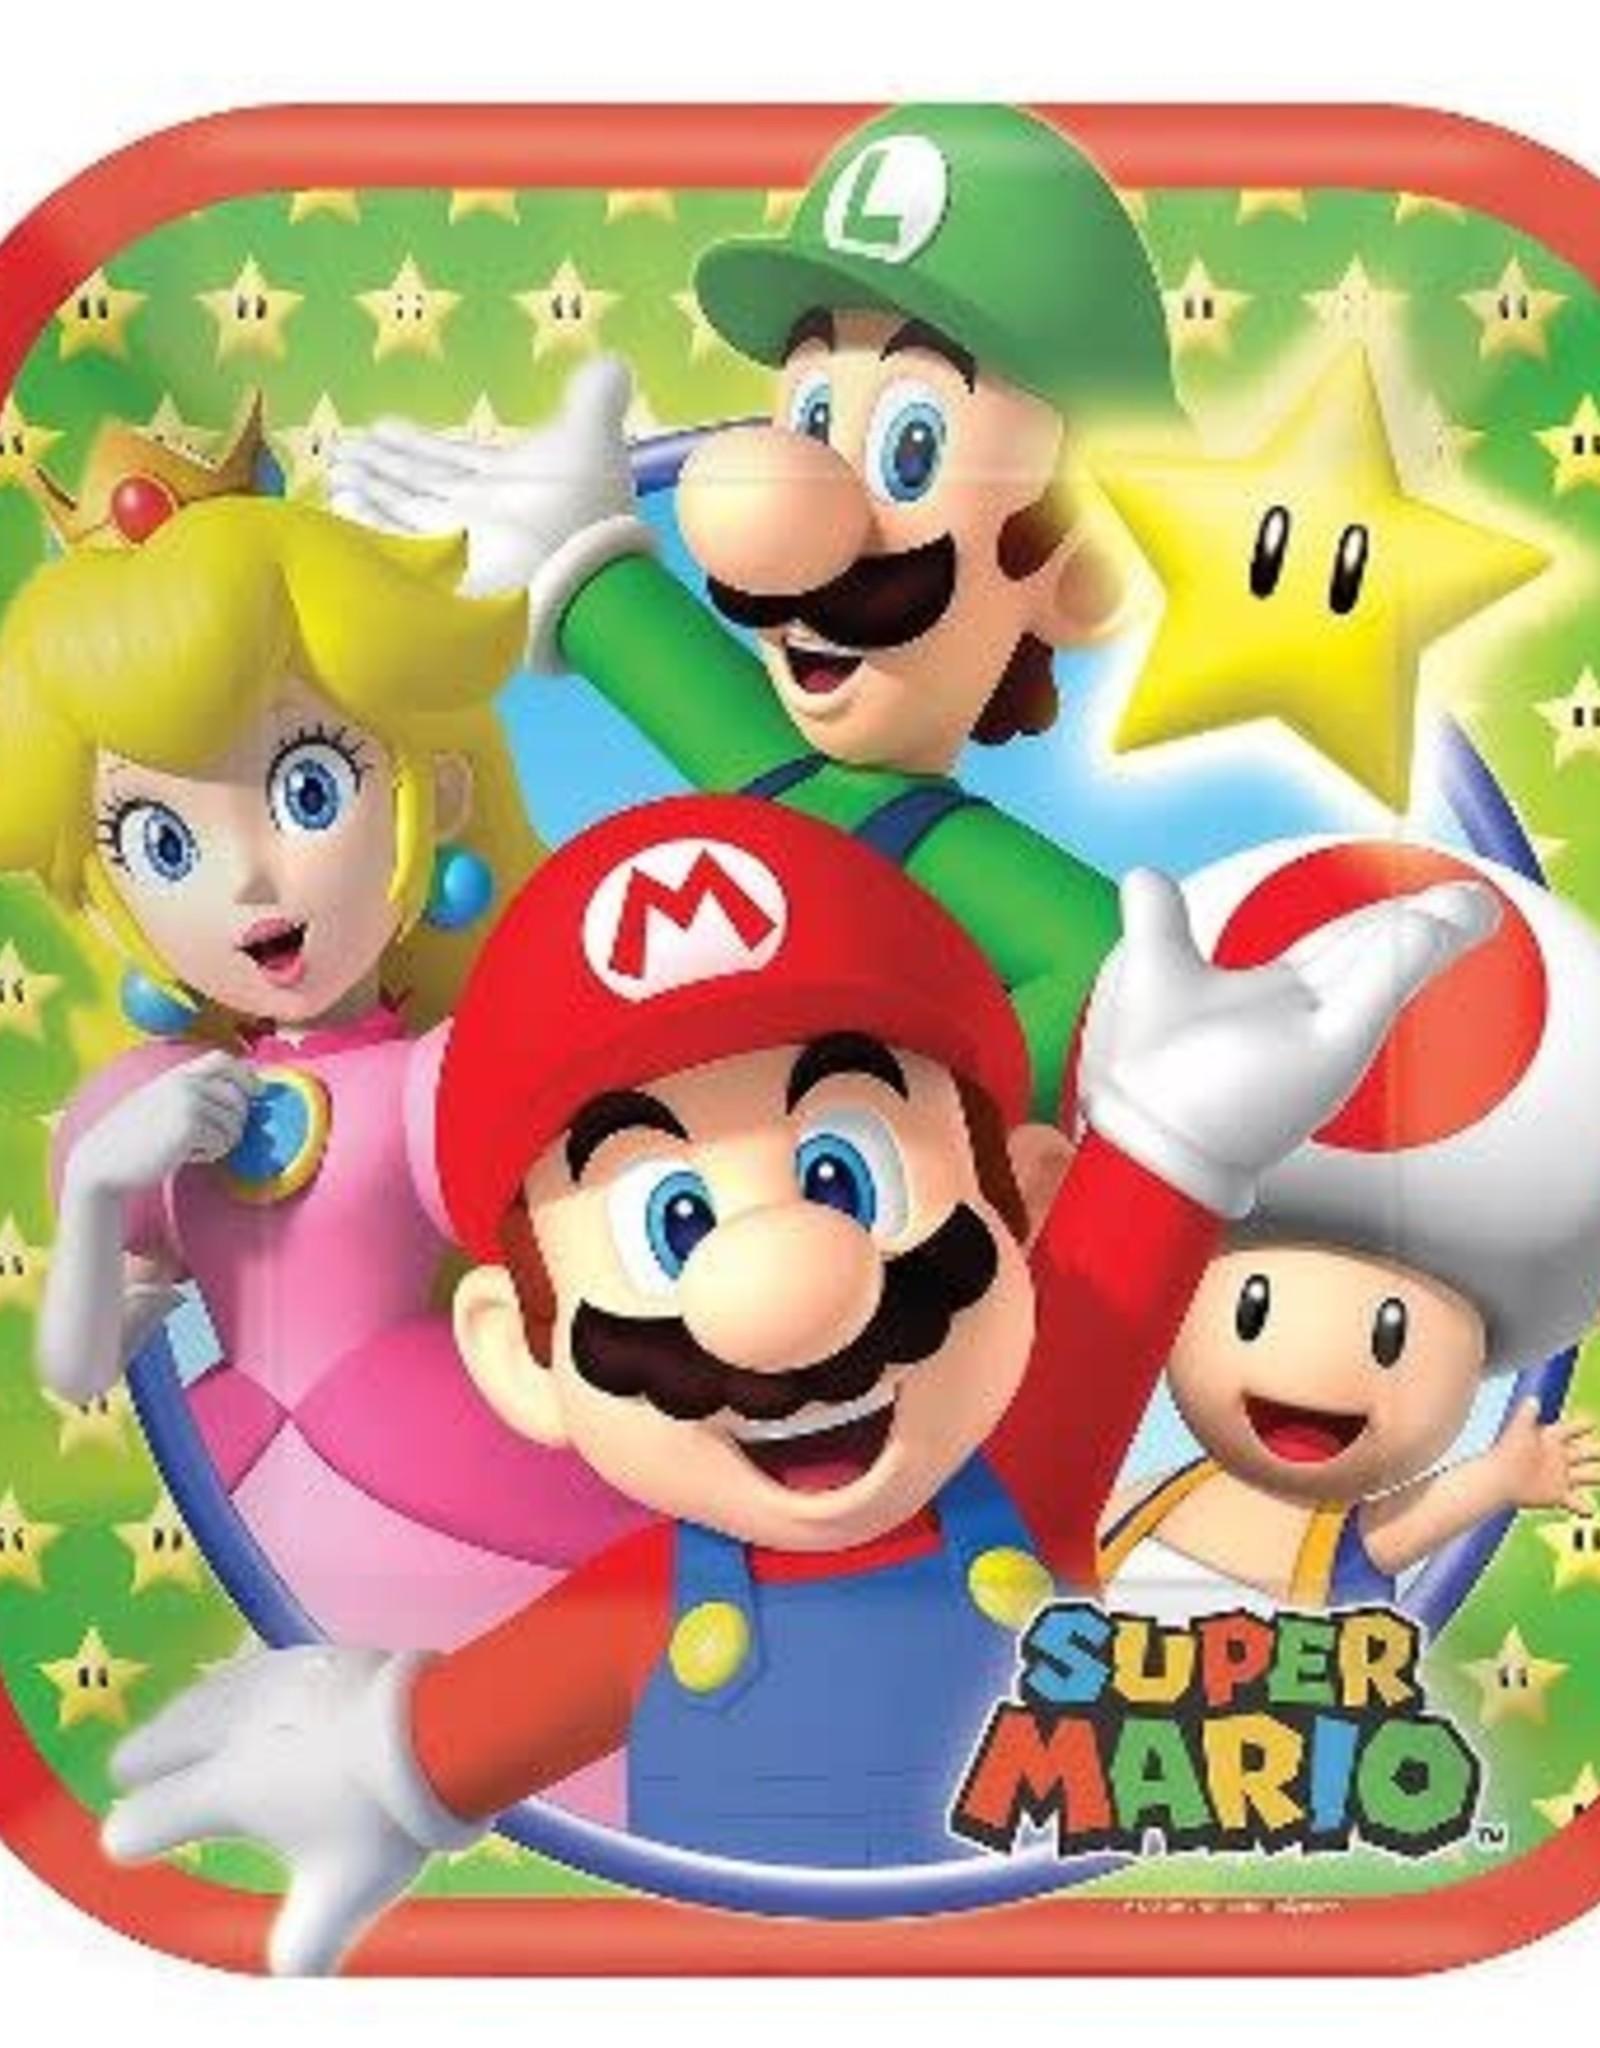 Super Mario 7 in Plate